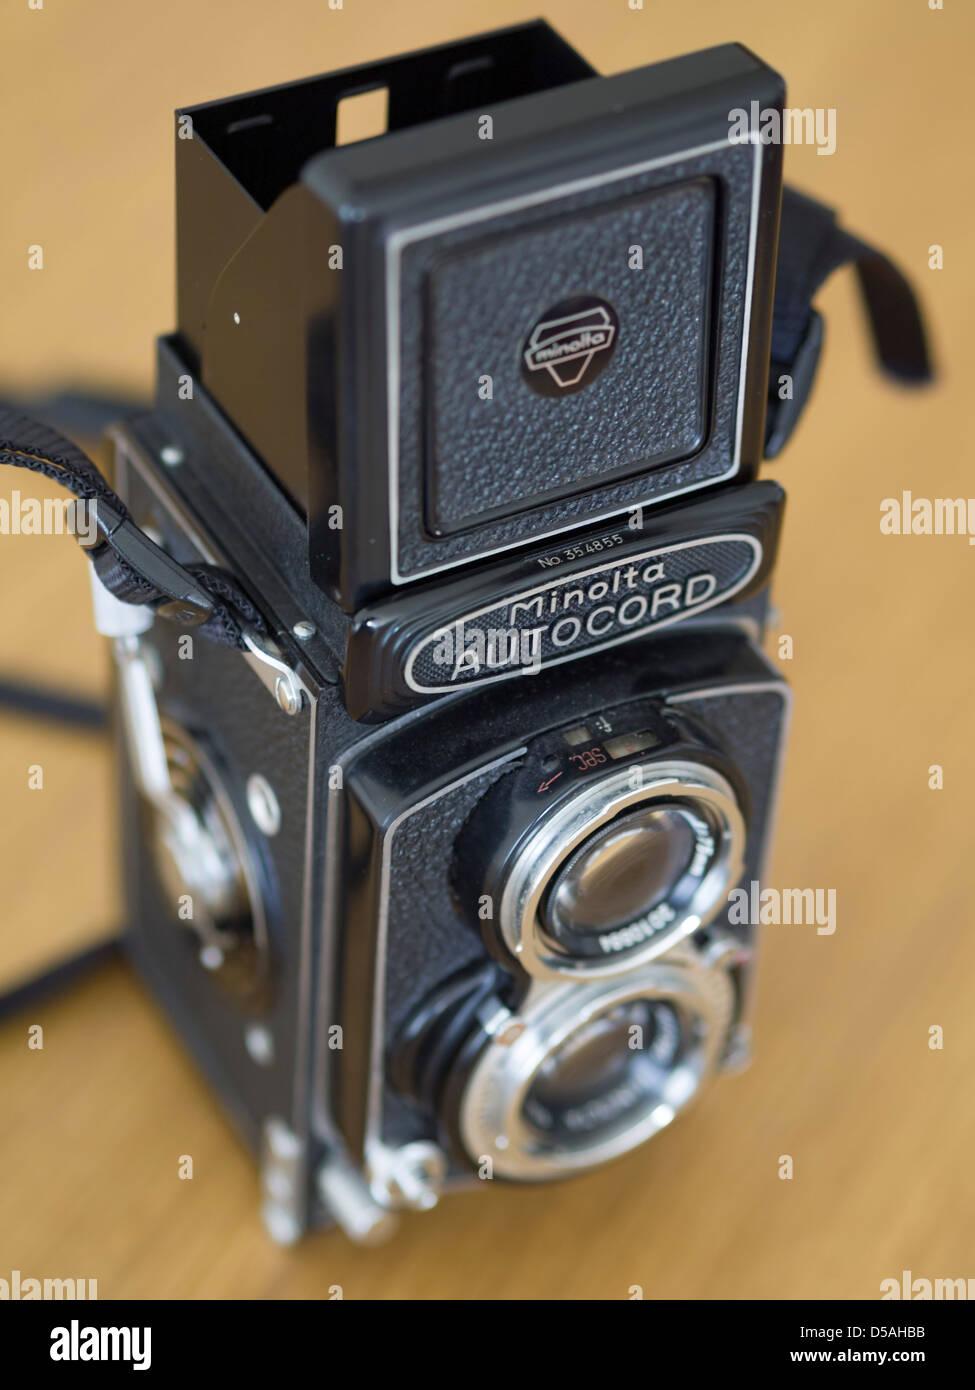 Minolta Autocord Twin Lens Reflex (TLR) old film camera - Stock Image